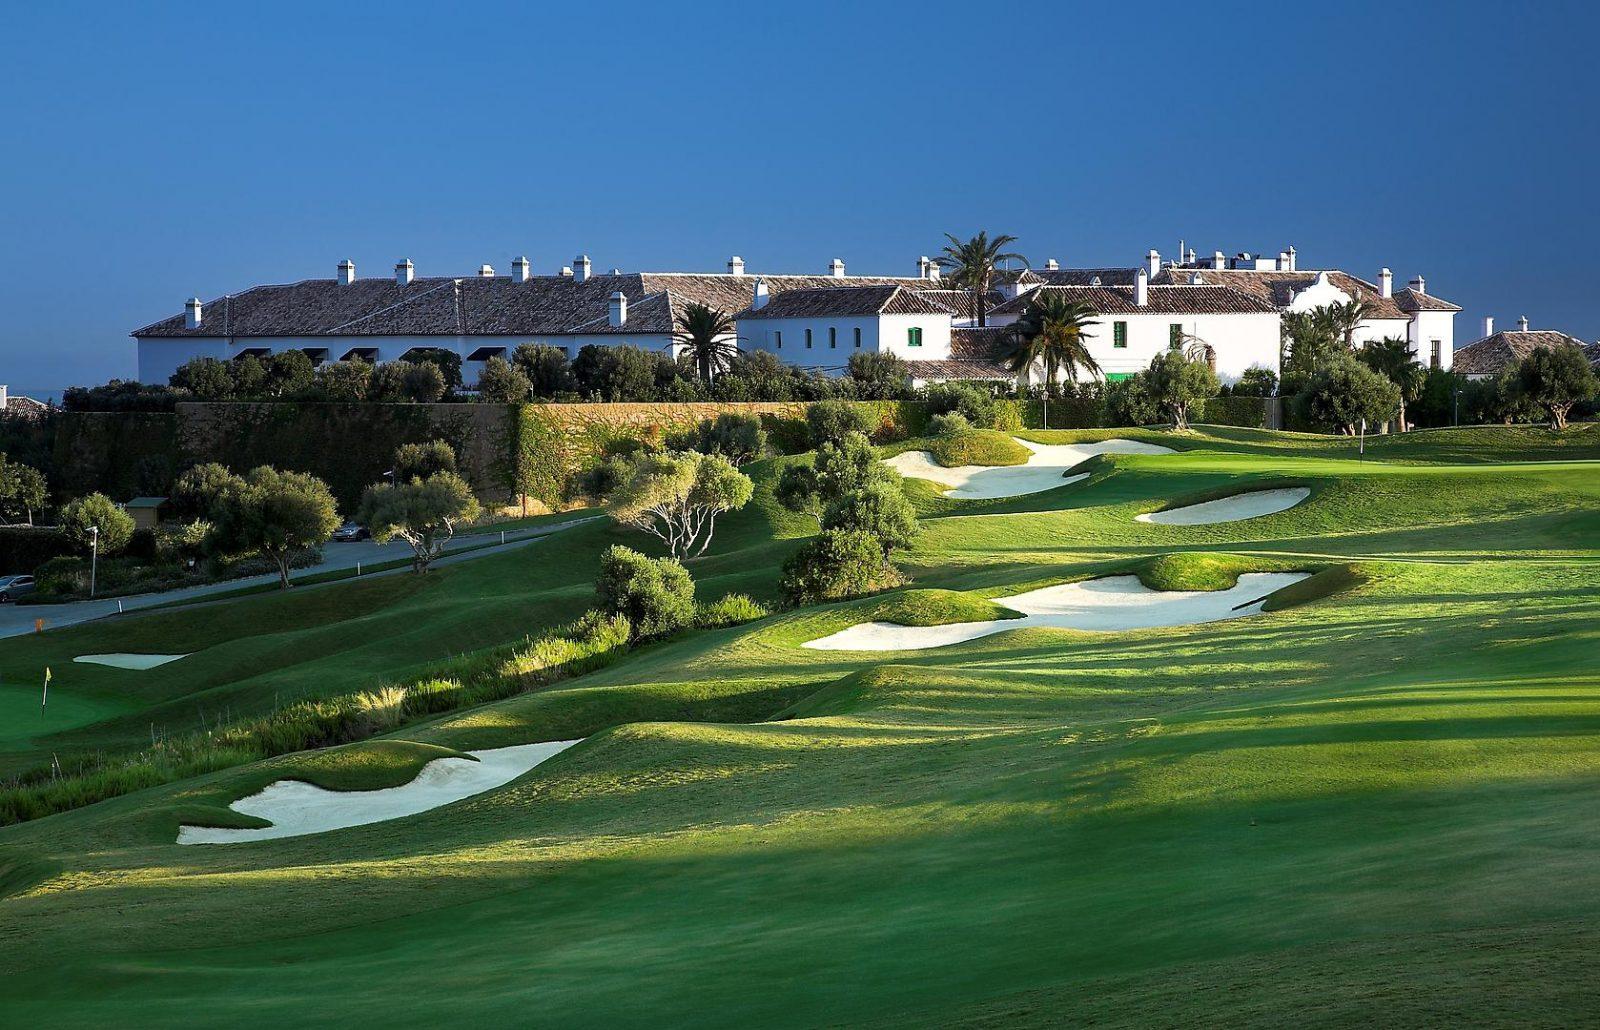 Costa del Sol golf-Spain Golf-Finca-Cortesin